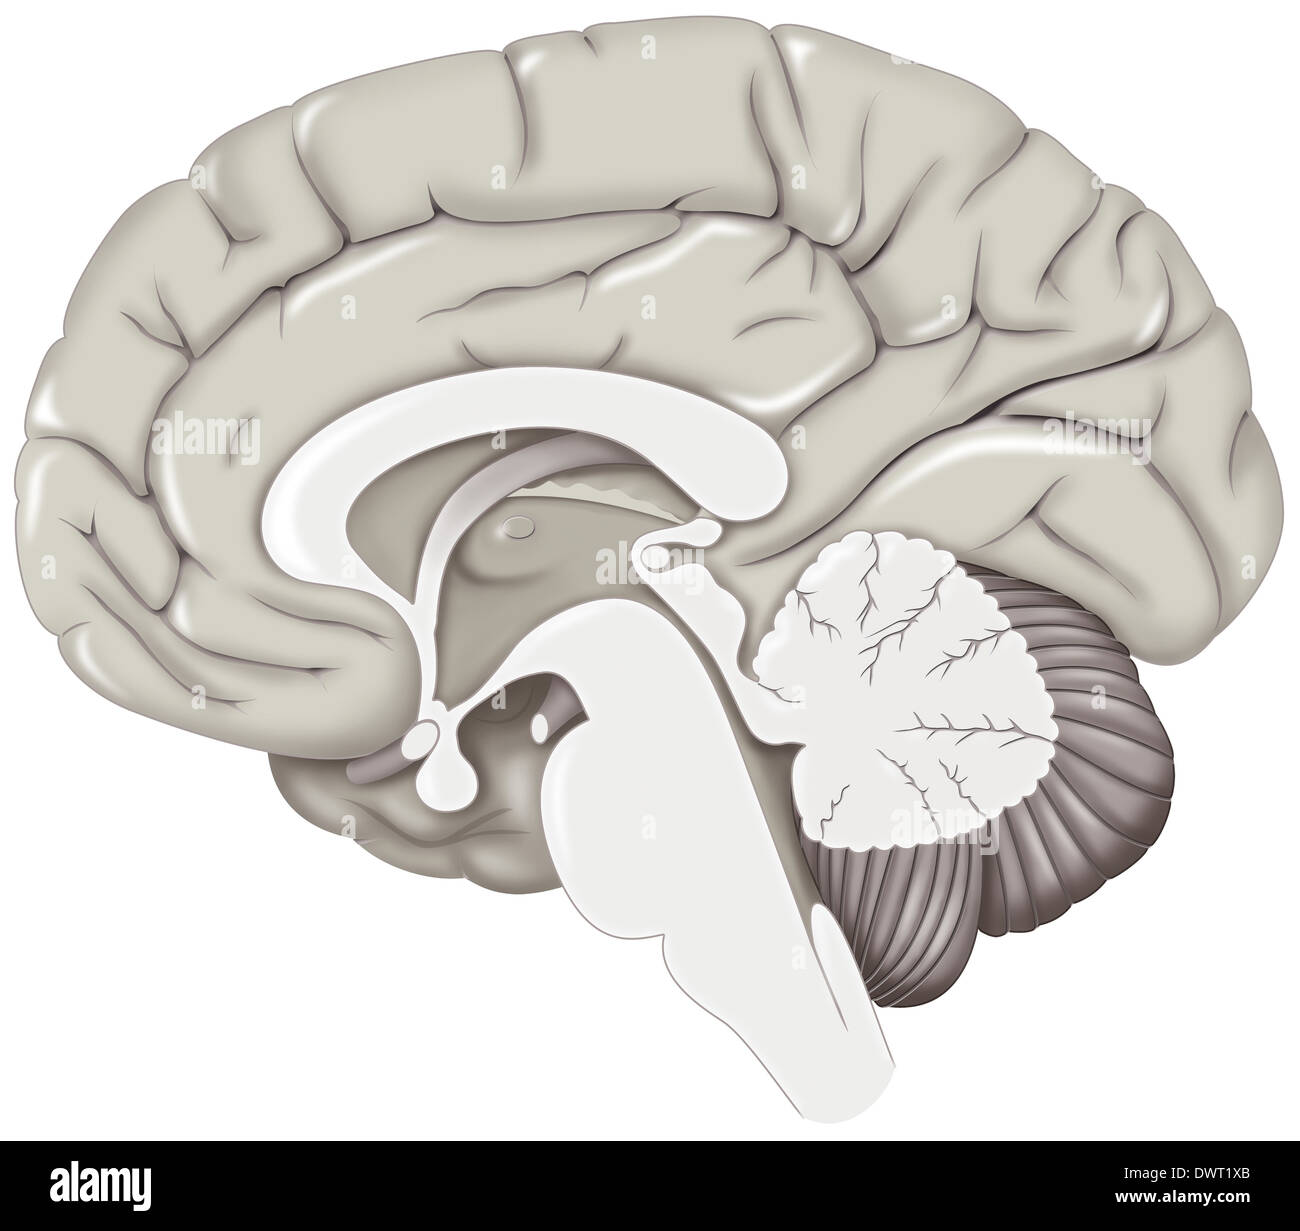 Brain, drawing - Stock Image